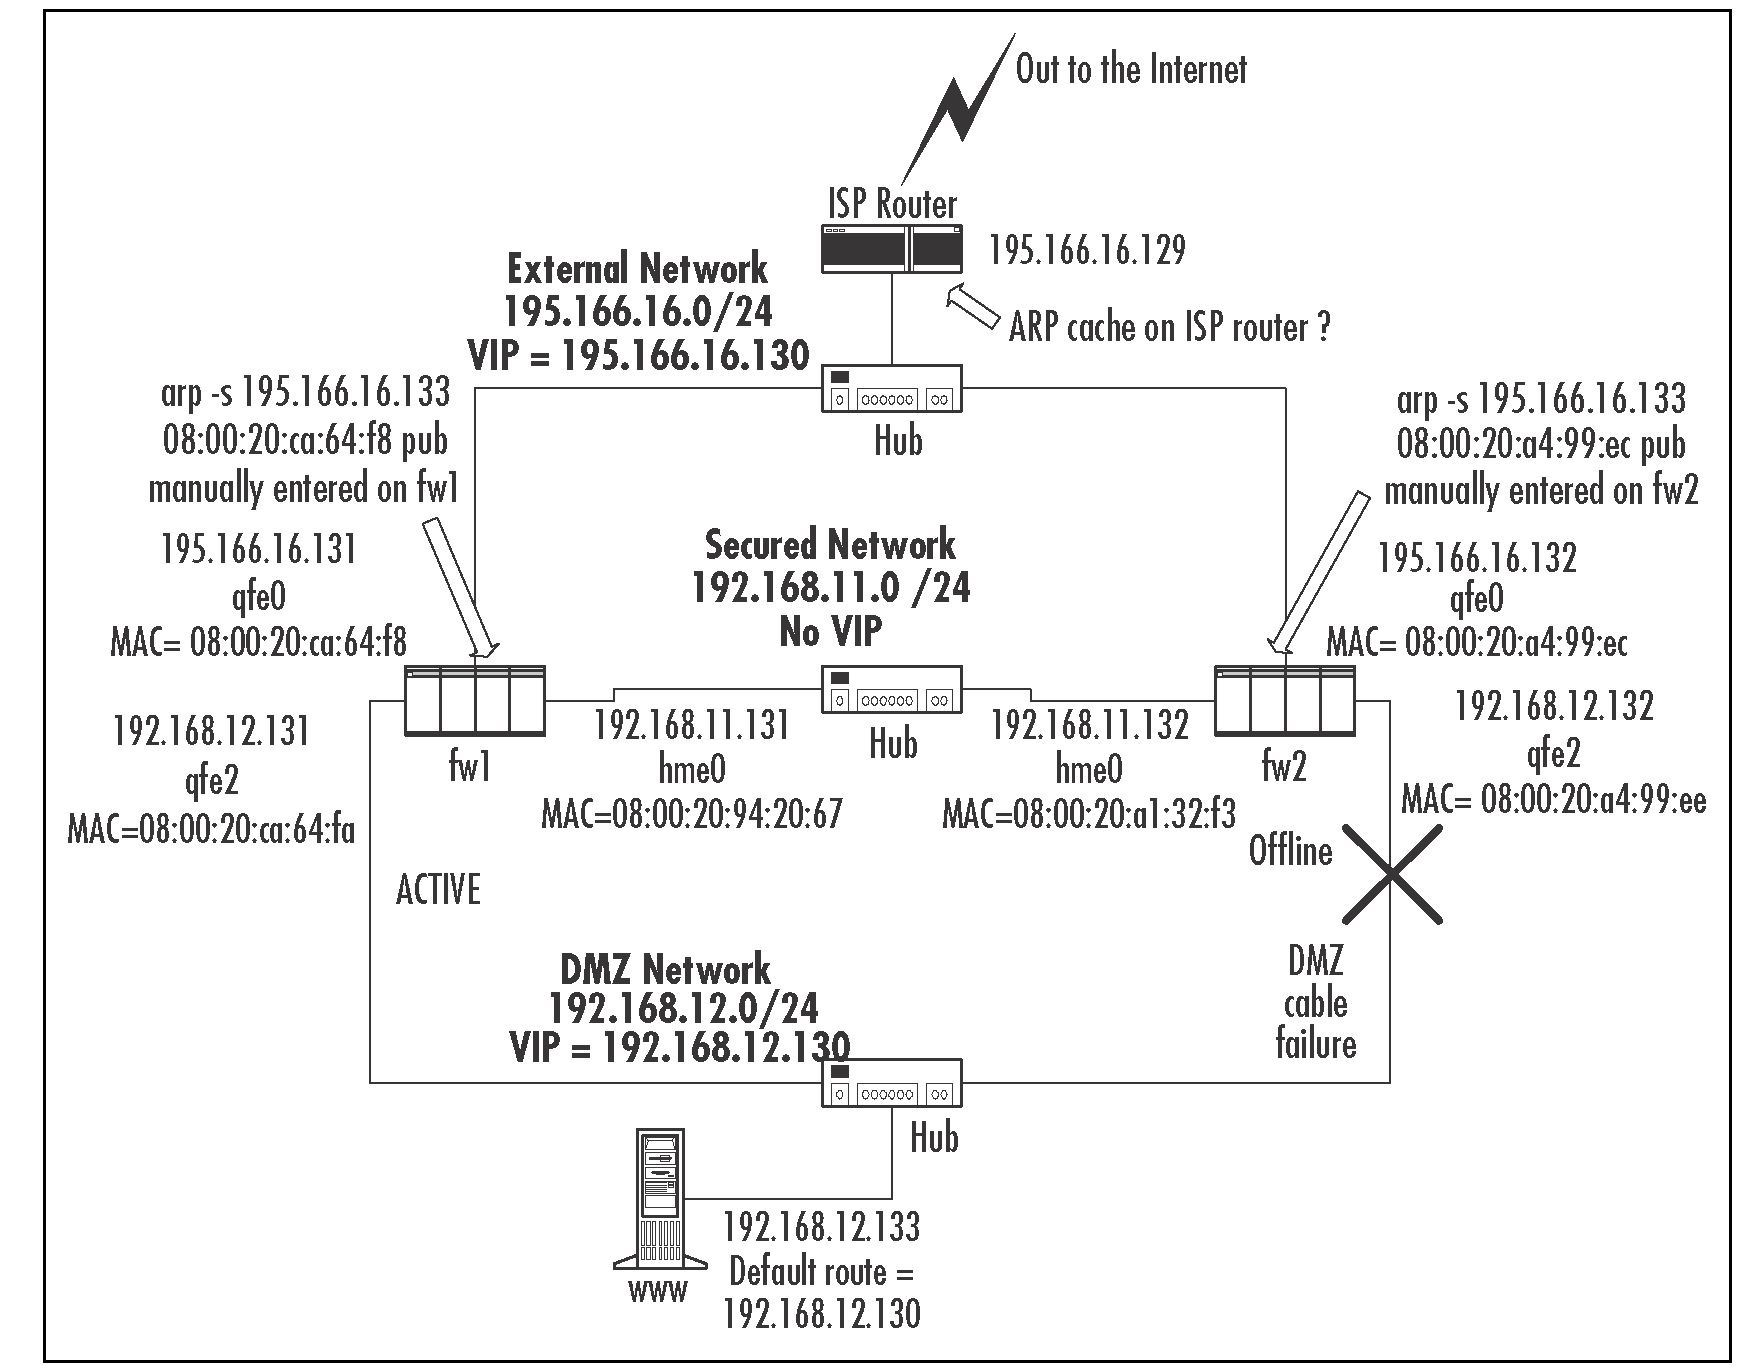 Checkpoint Manual Nat Arp